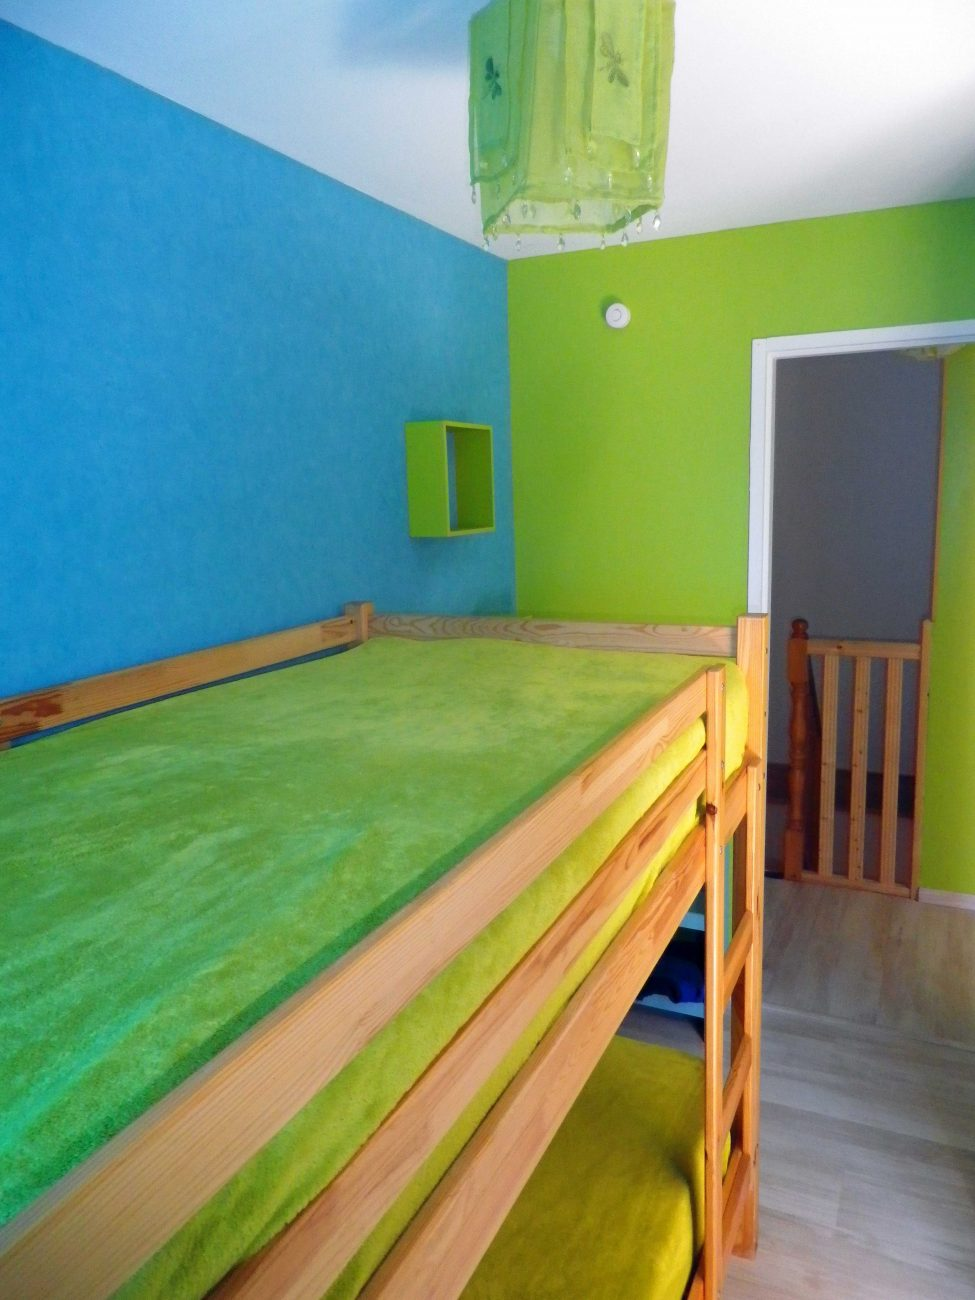 huisje-maisonette-cottage-bunkbed-1-HHQ-web